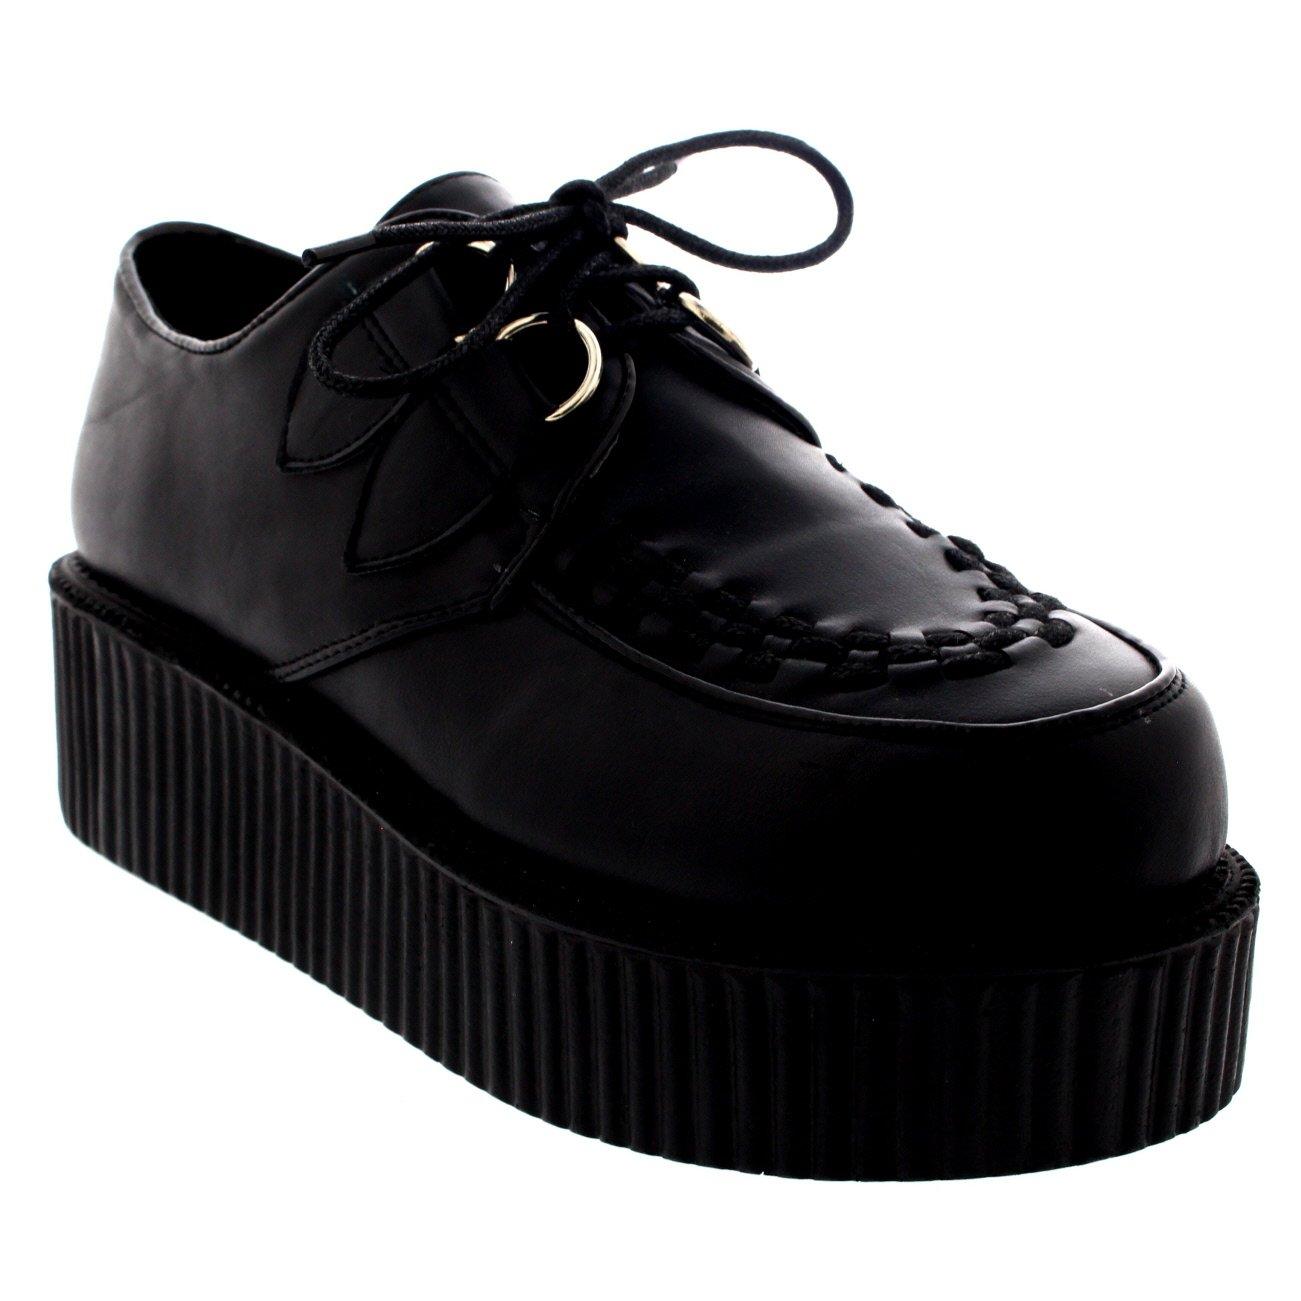 a324b8a7f1d0d Viva Womens Double Platform Punk Goth Flatform Brothel Creepers Retro Shoes